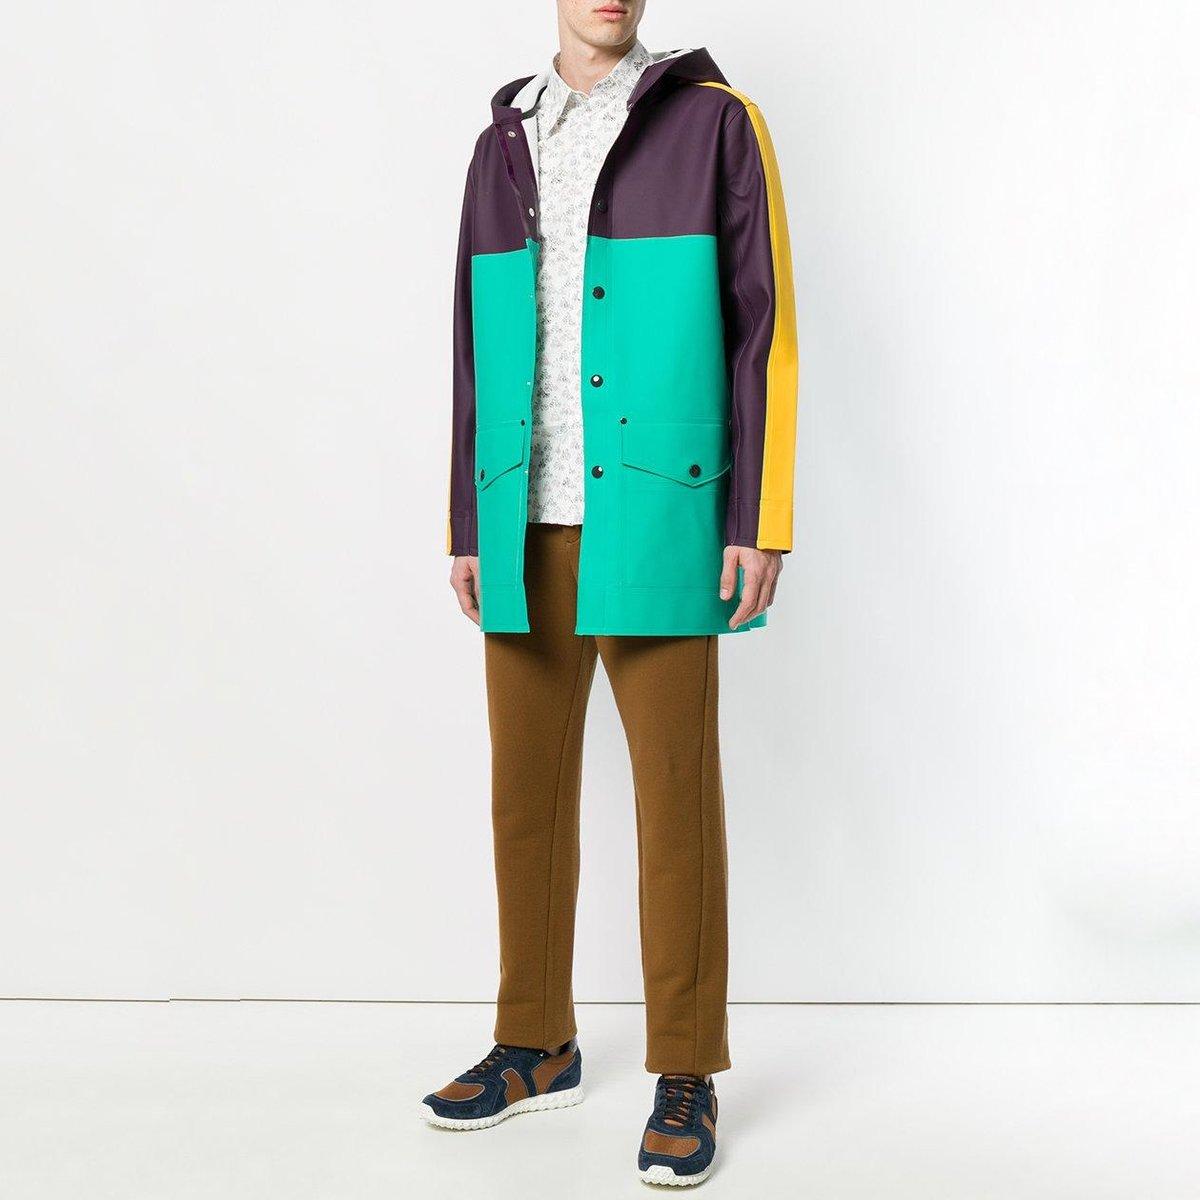 marni-Brown-Tailored-Track-Pants (3).jpg